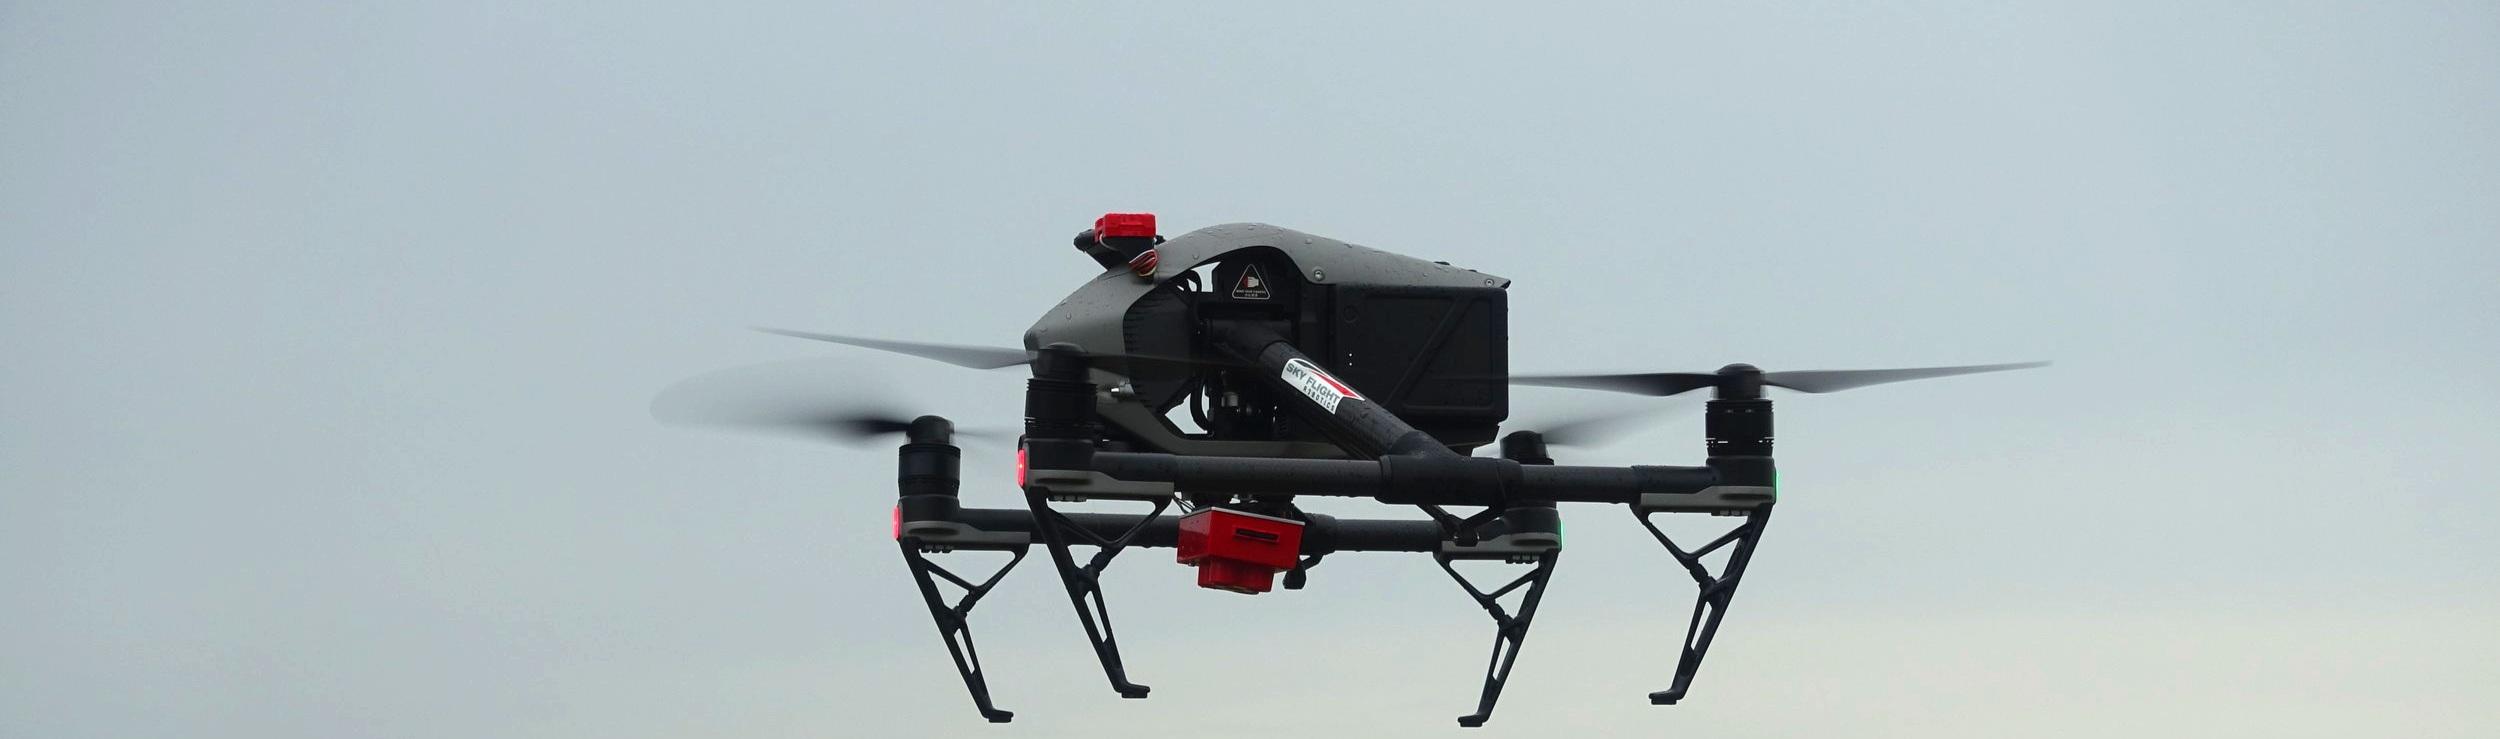 Micasense RedEdge & Mount Kits — Sky Flight Robotics